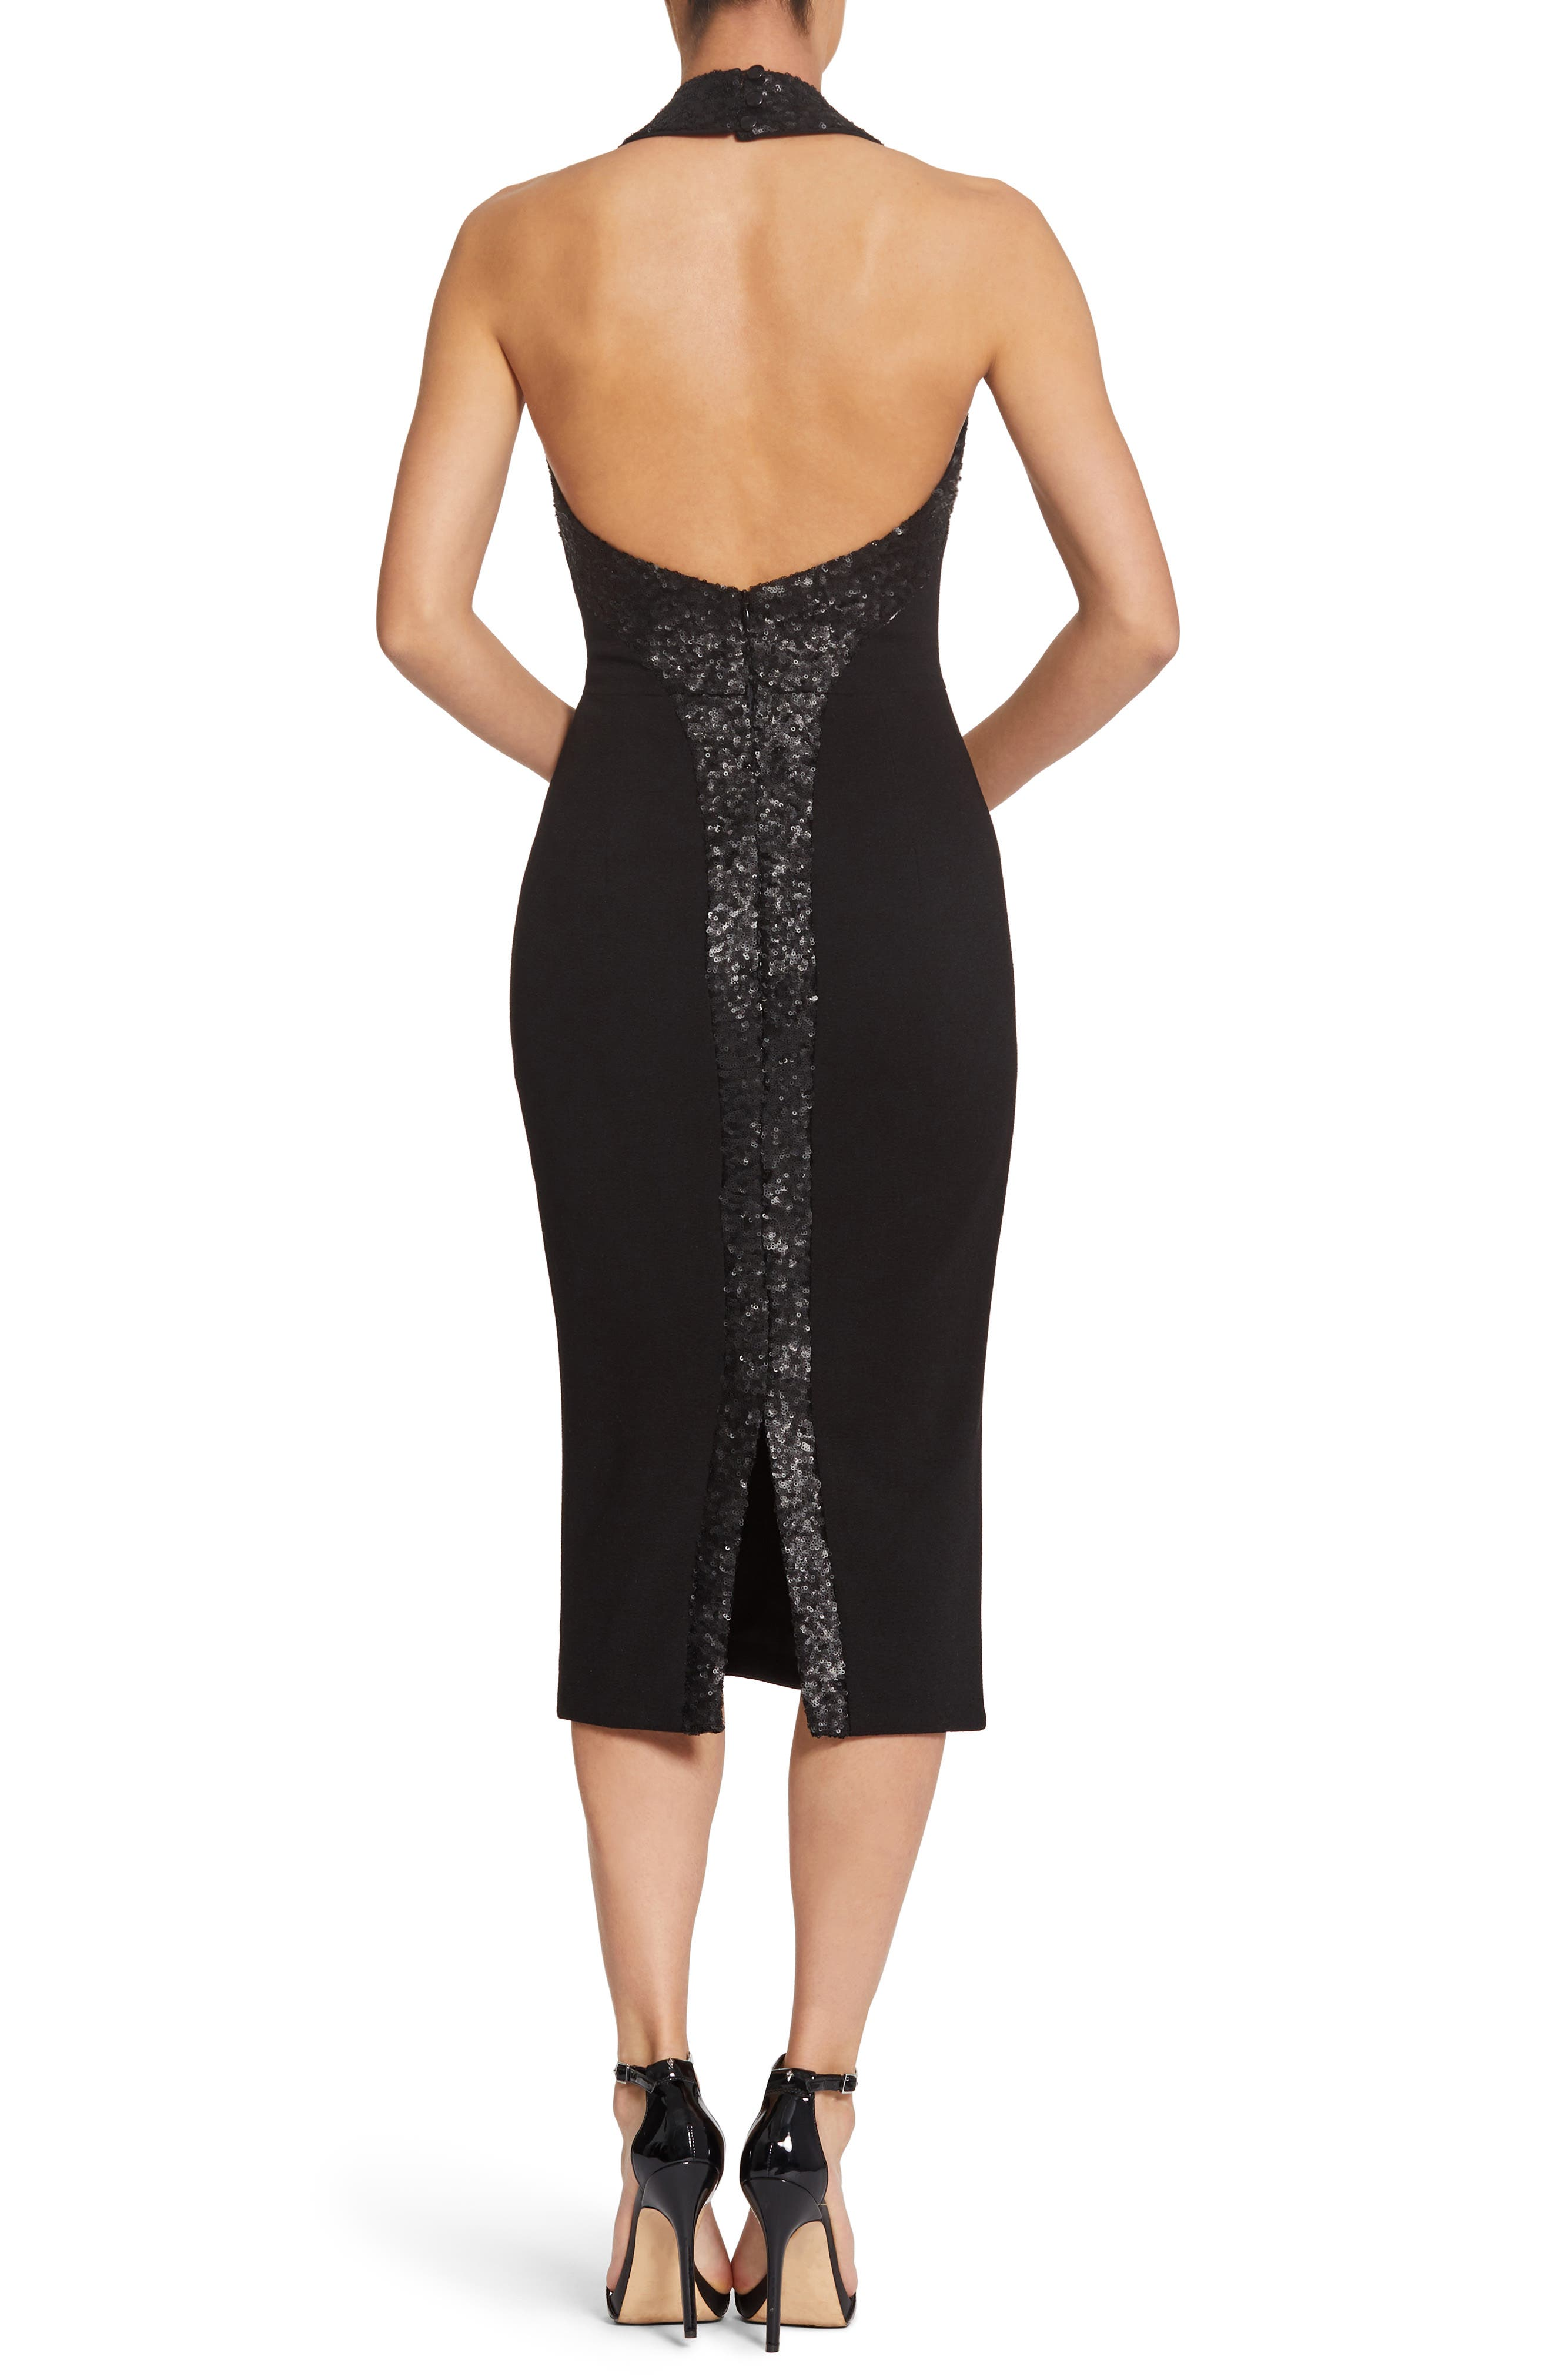 Cleo Halter Dress,                             Alternate thumbnail 3, color,                             BLACK/ BLACK